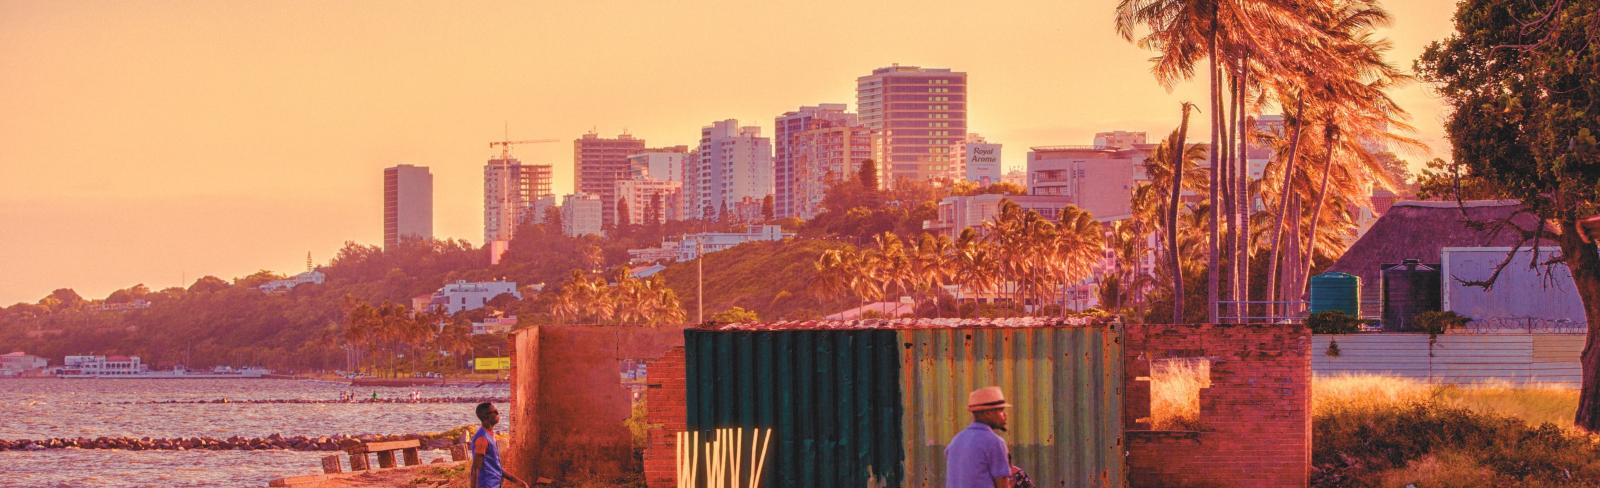 Maputo, Mozambique Skyline. Photo by Rohan Reddy on Unsplash